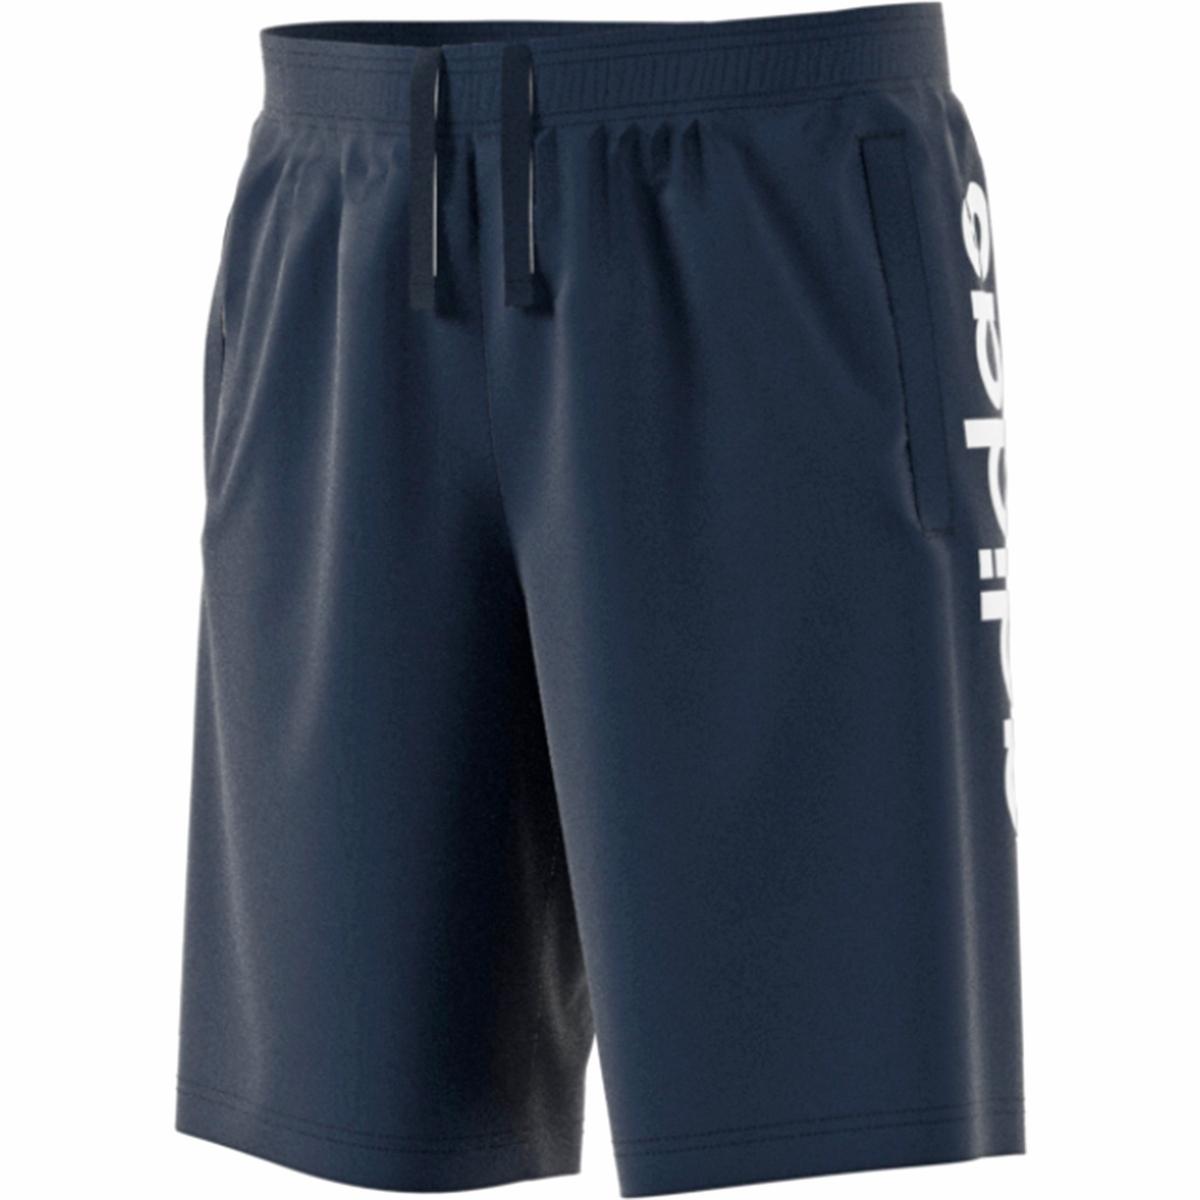 Shorts in jersey con maxi logo